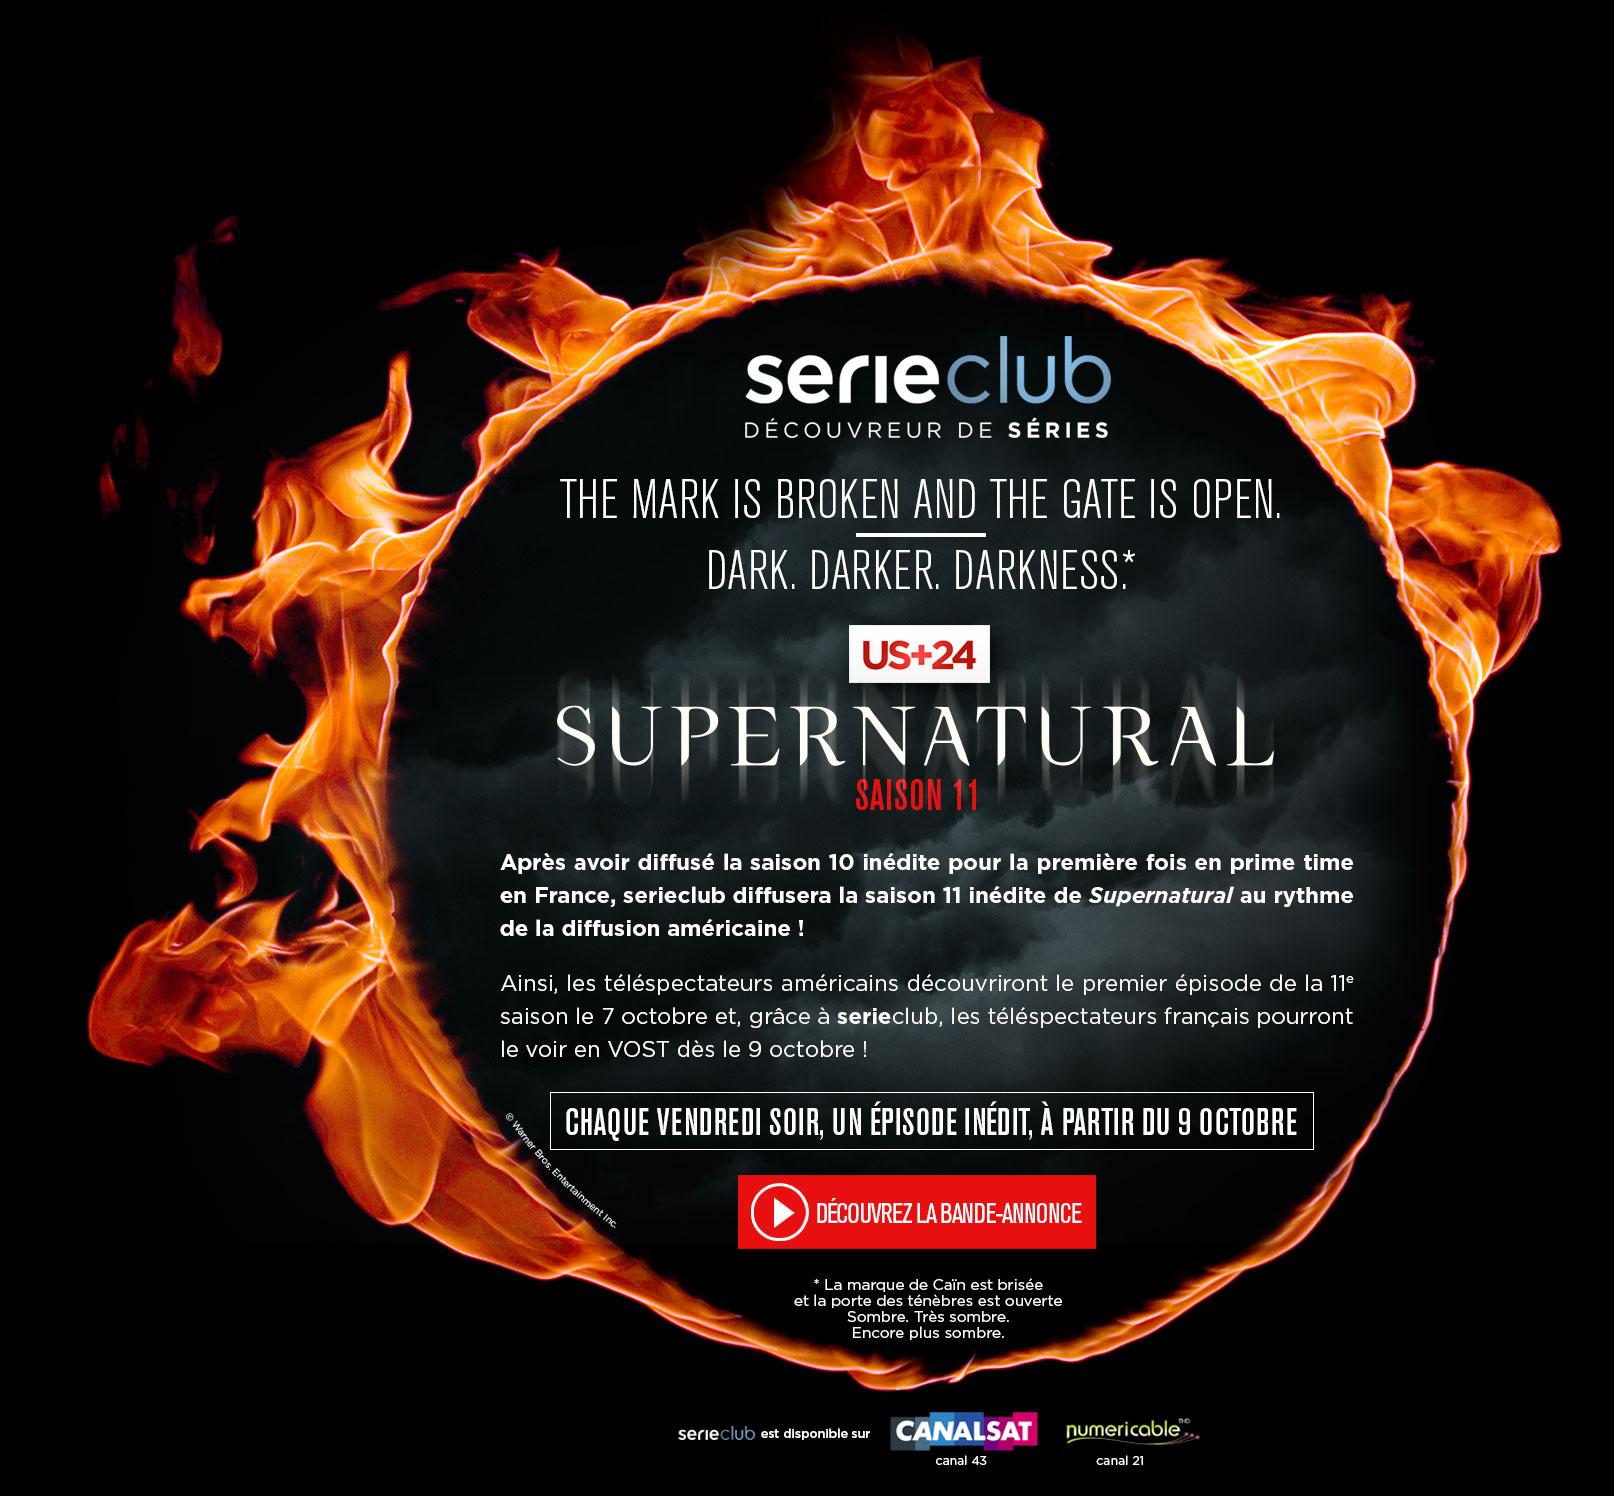 Supernatural-S11_serieclub